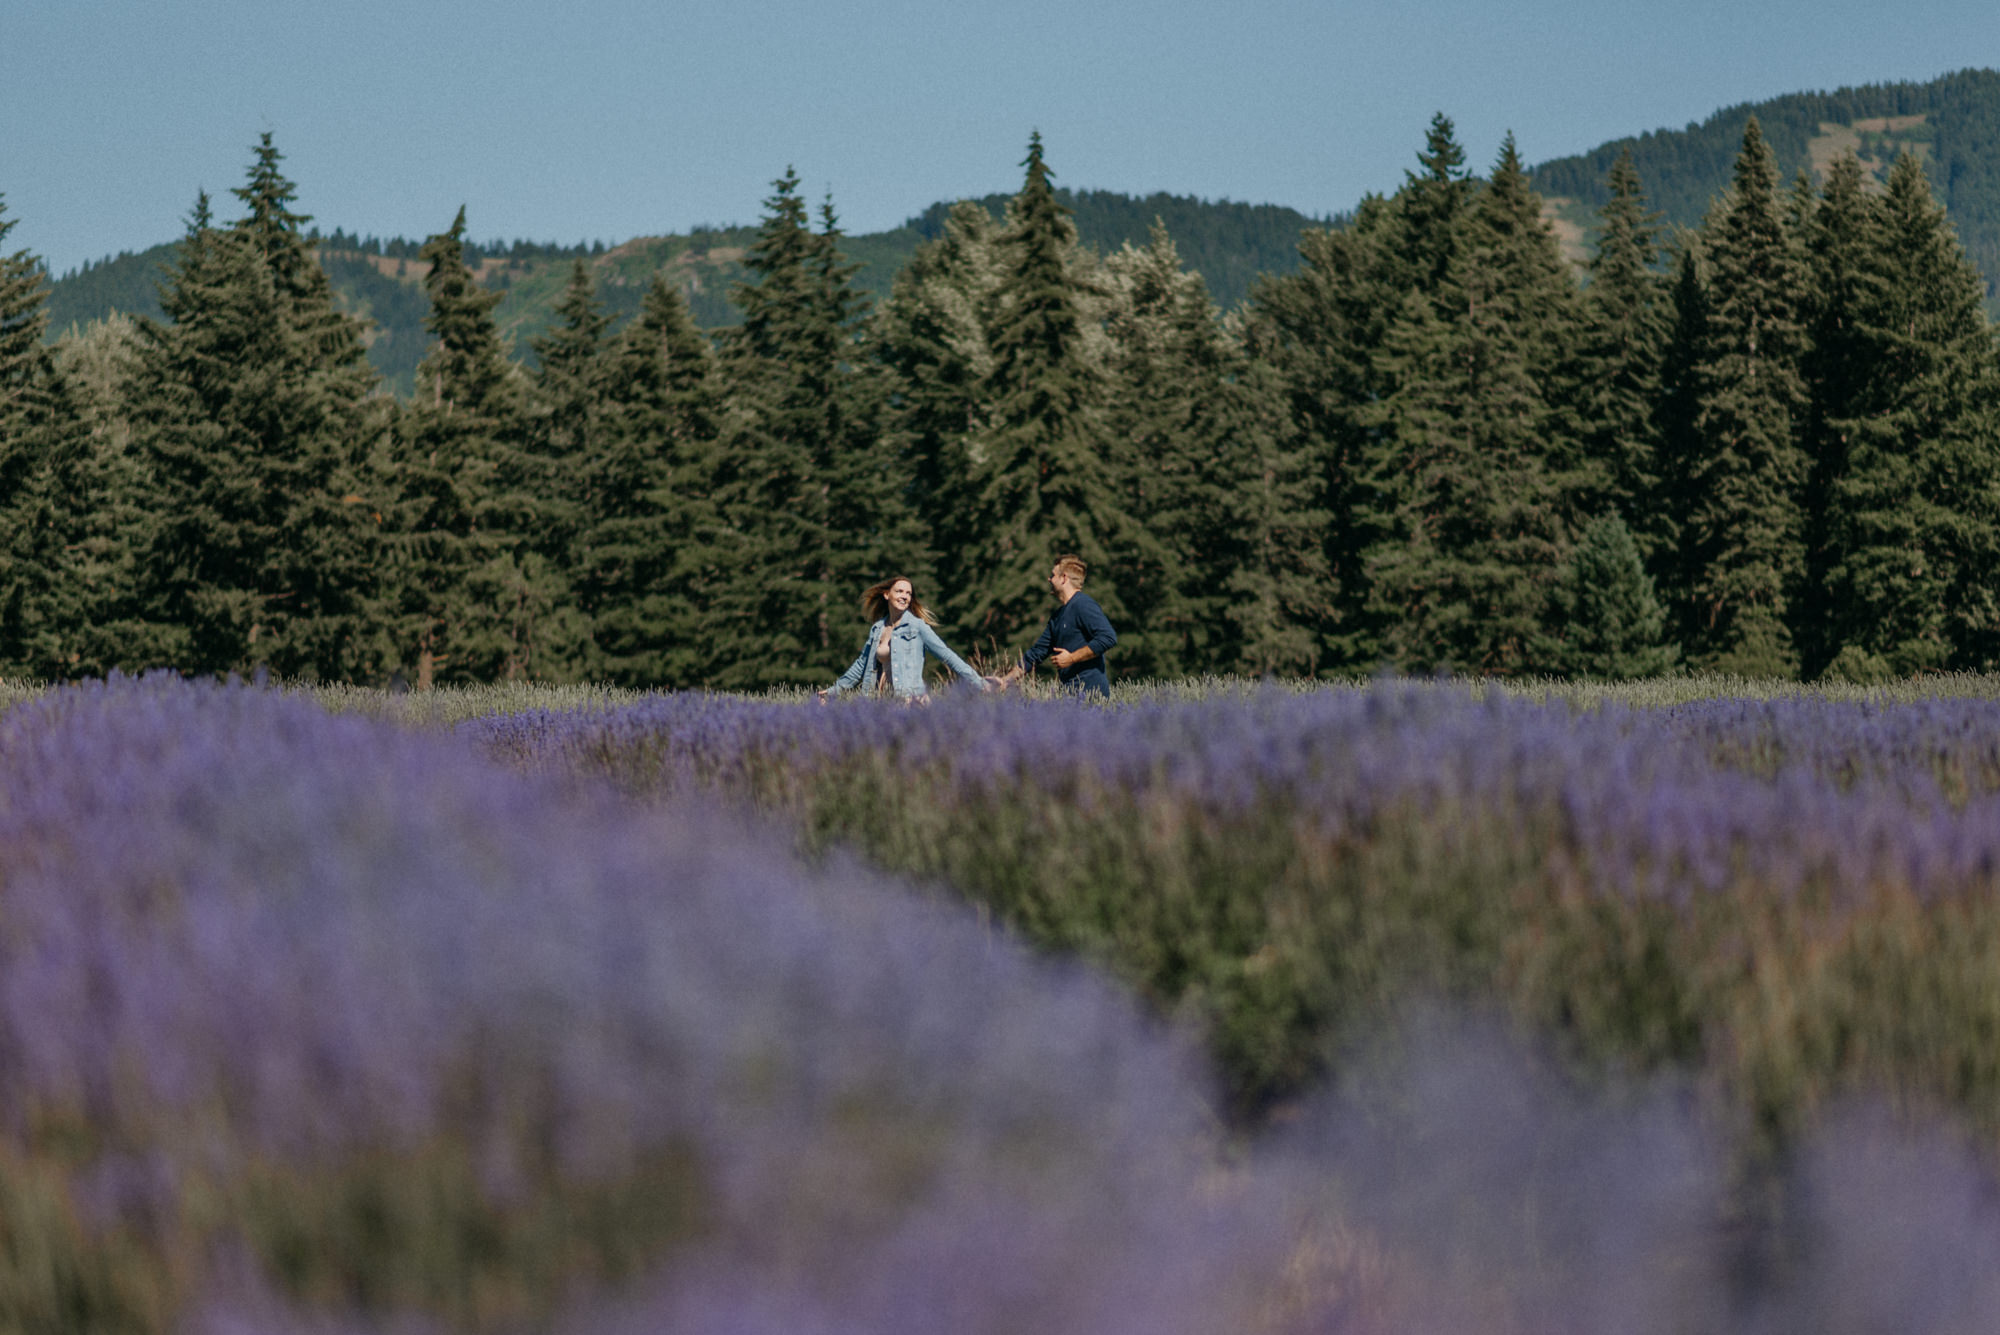 21-Mt-hood-lavender-farms-engagment-couple-summer-7561.jpg